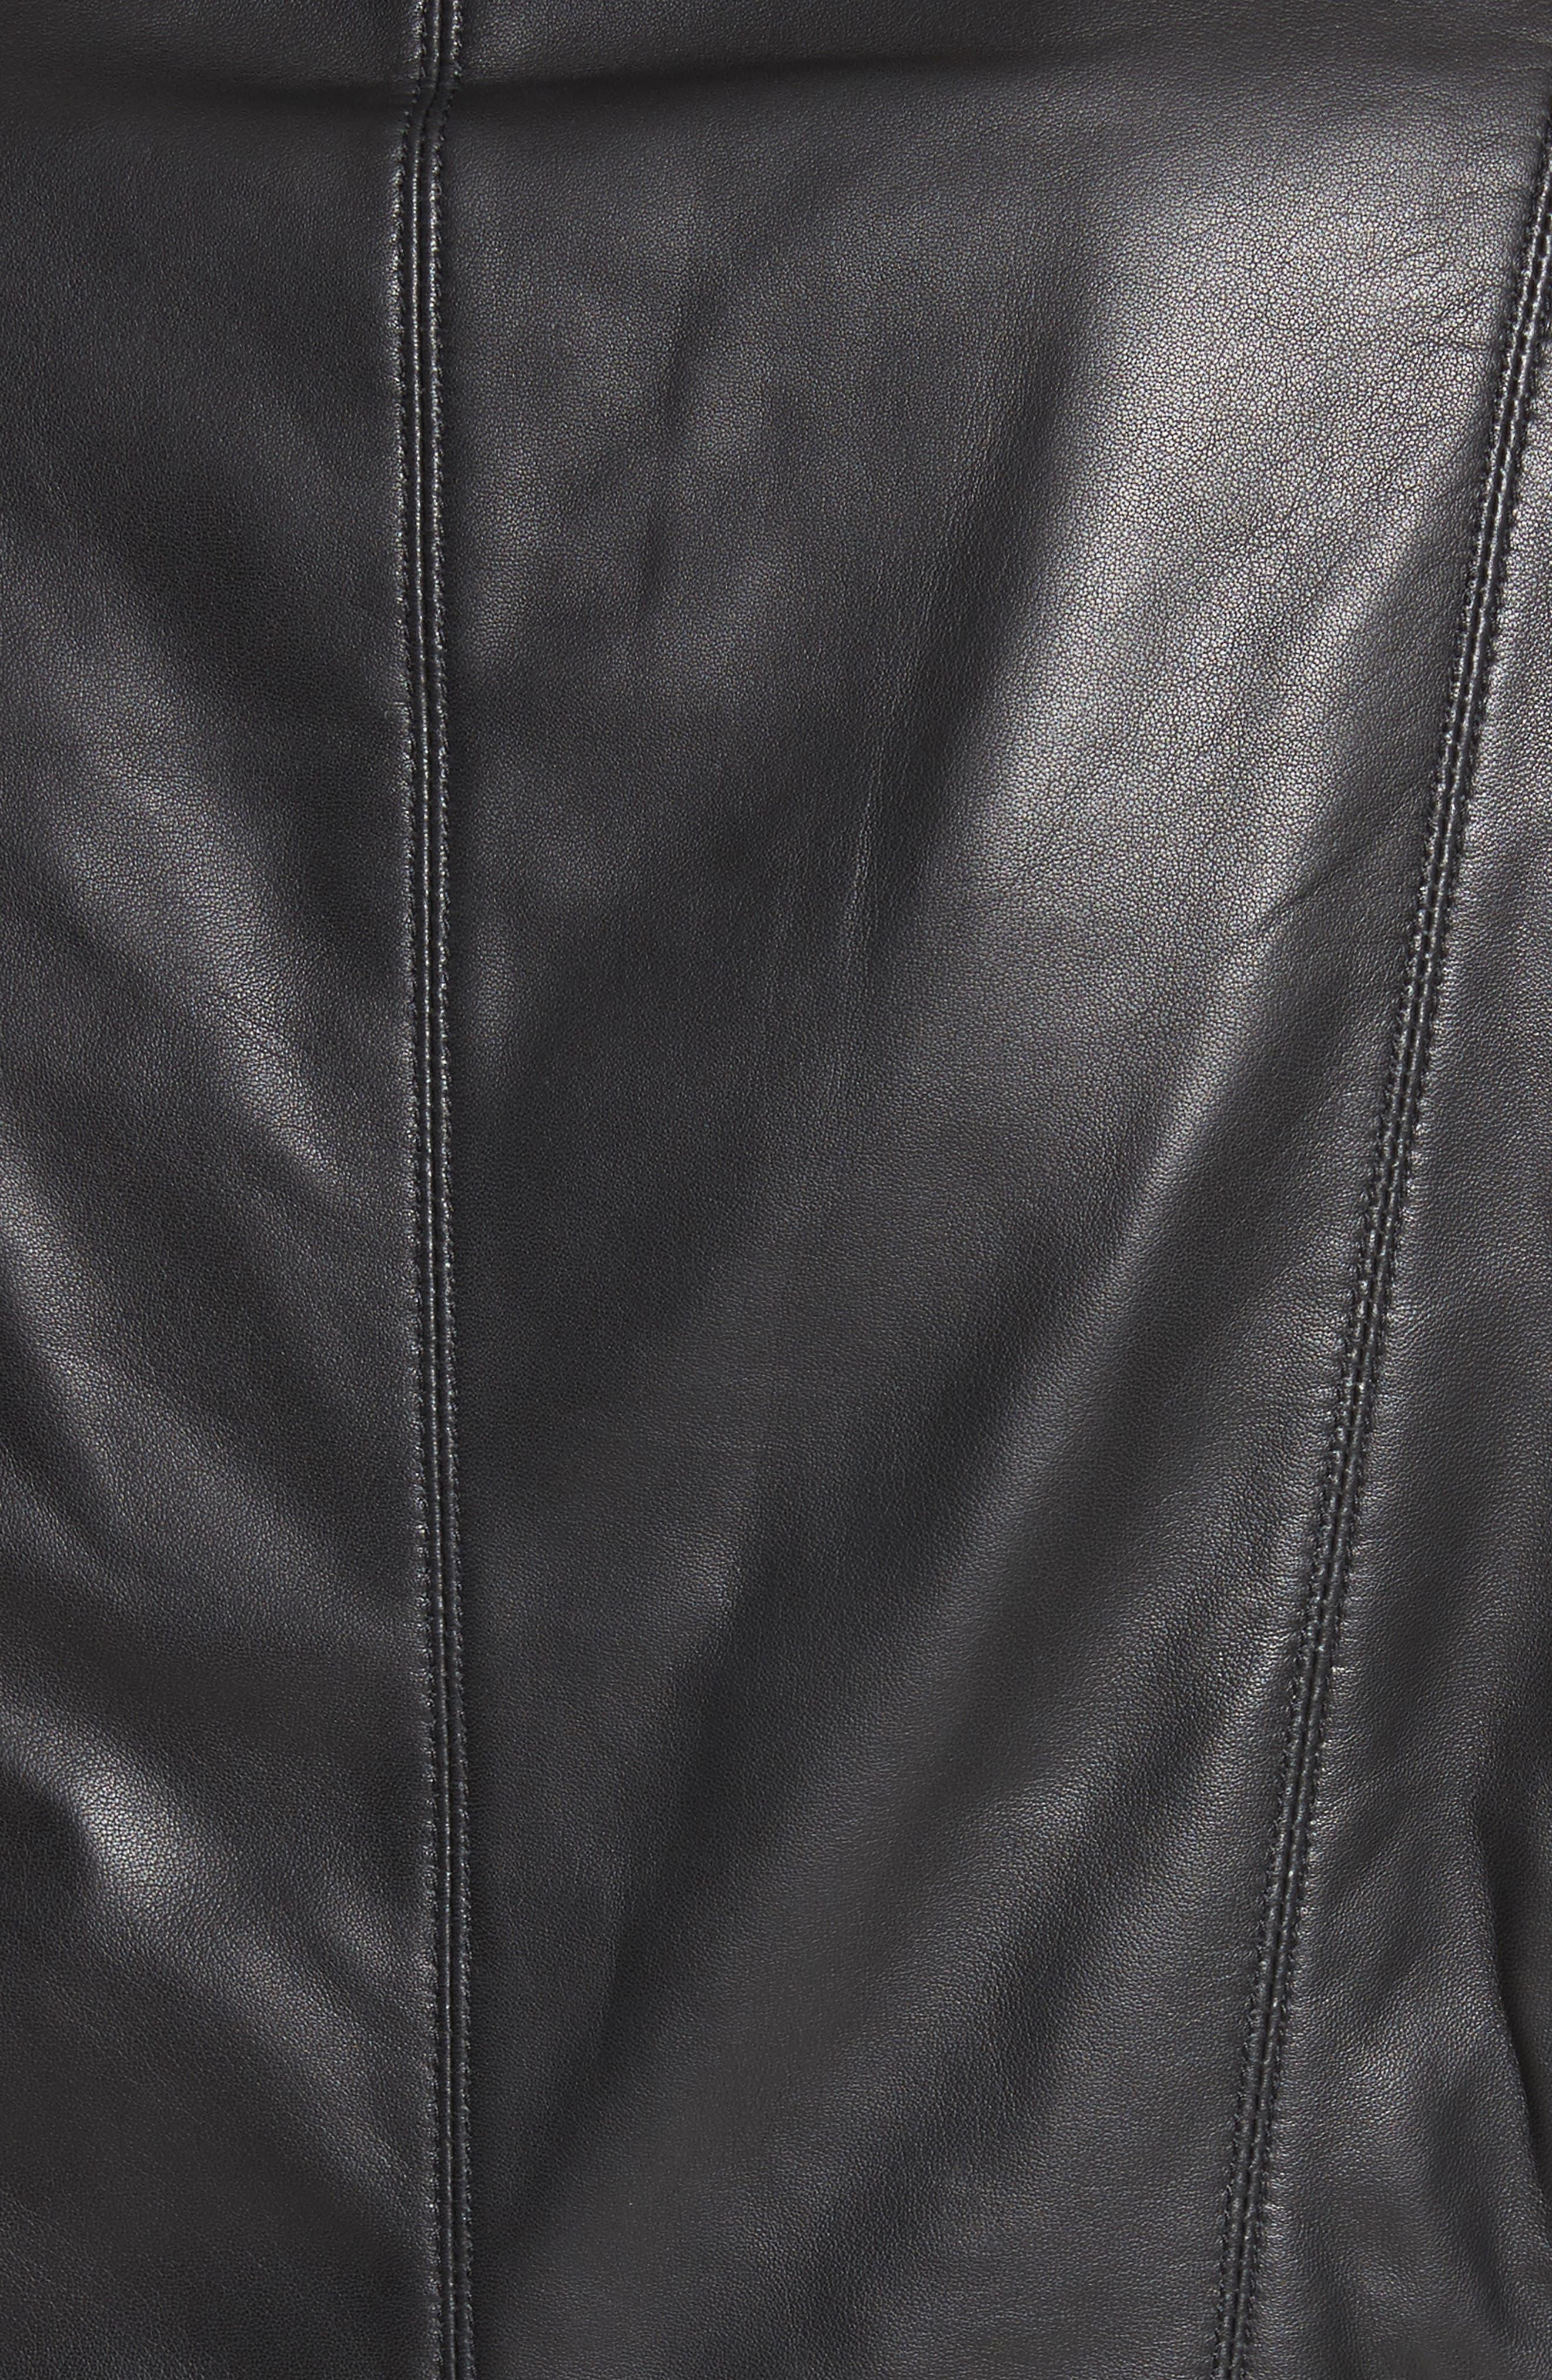 Nappa Leather Moto Jacket,                             Alternate thumbnail 6, color,                             001